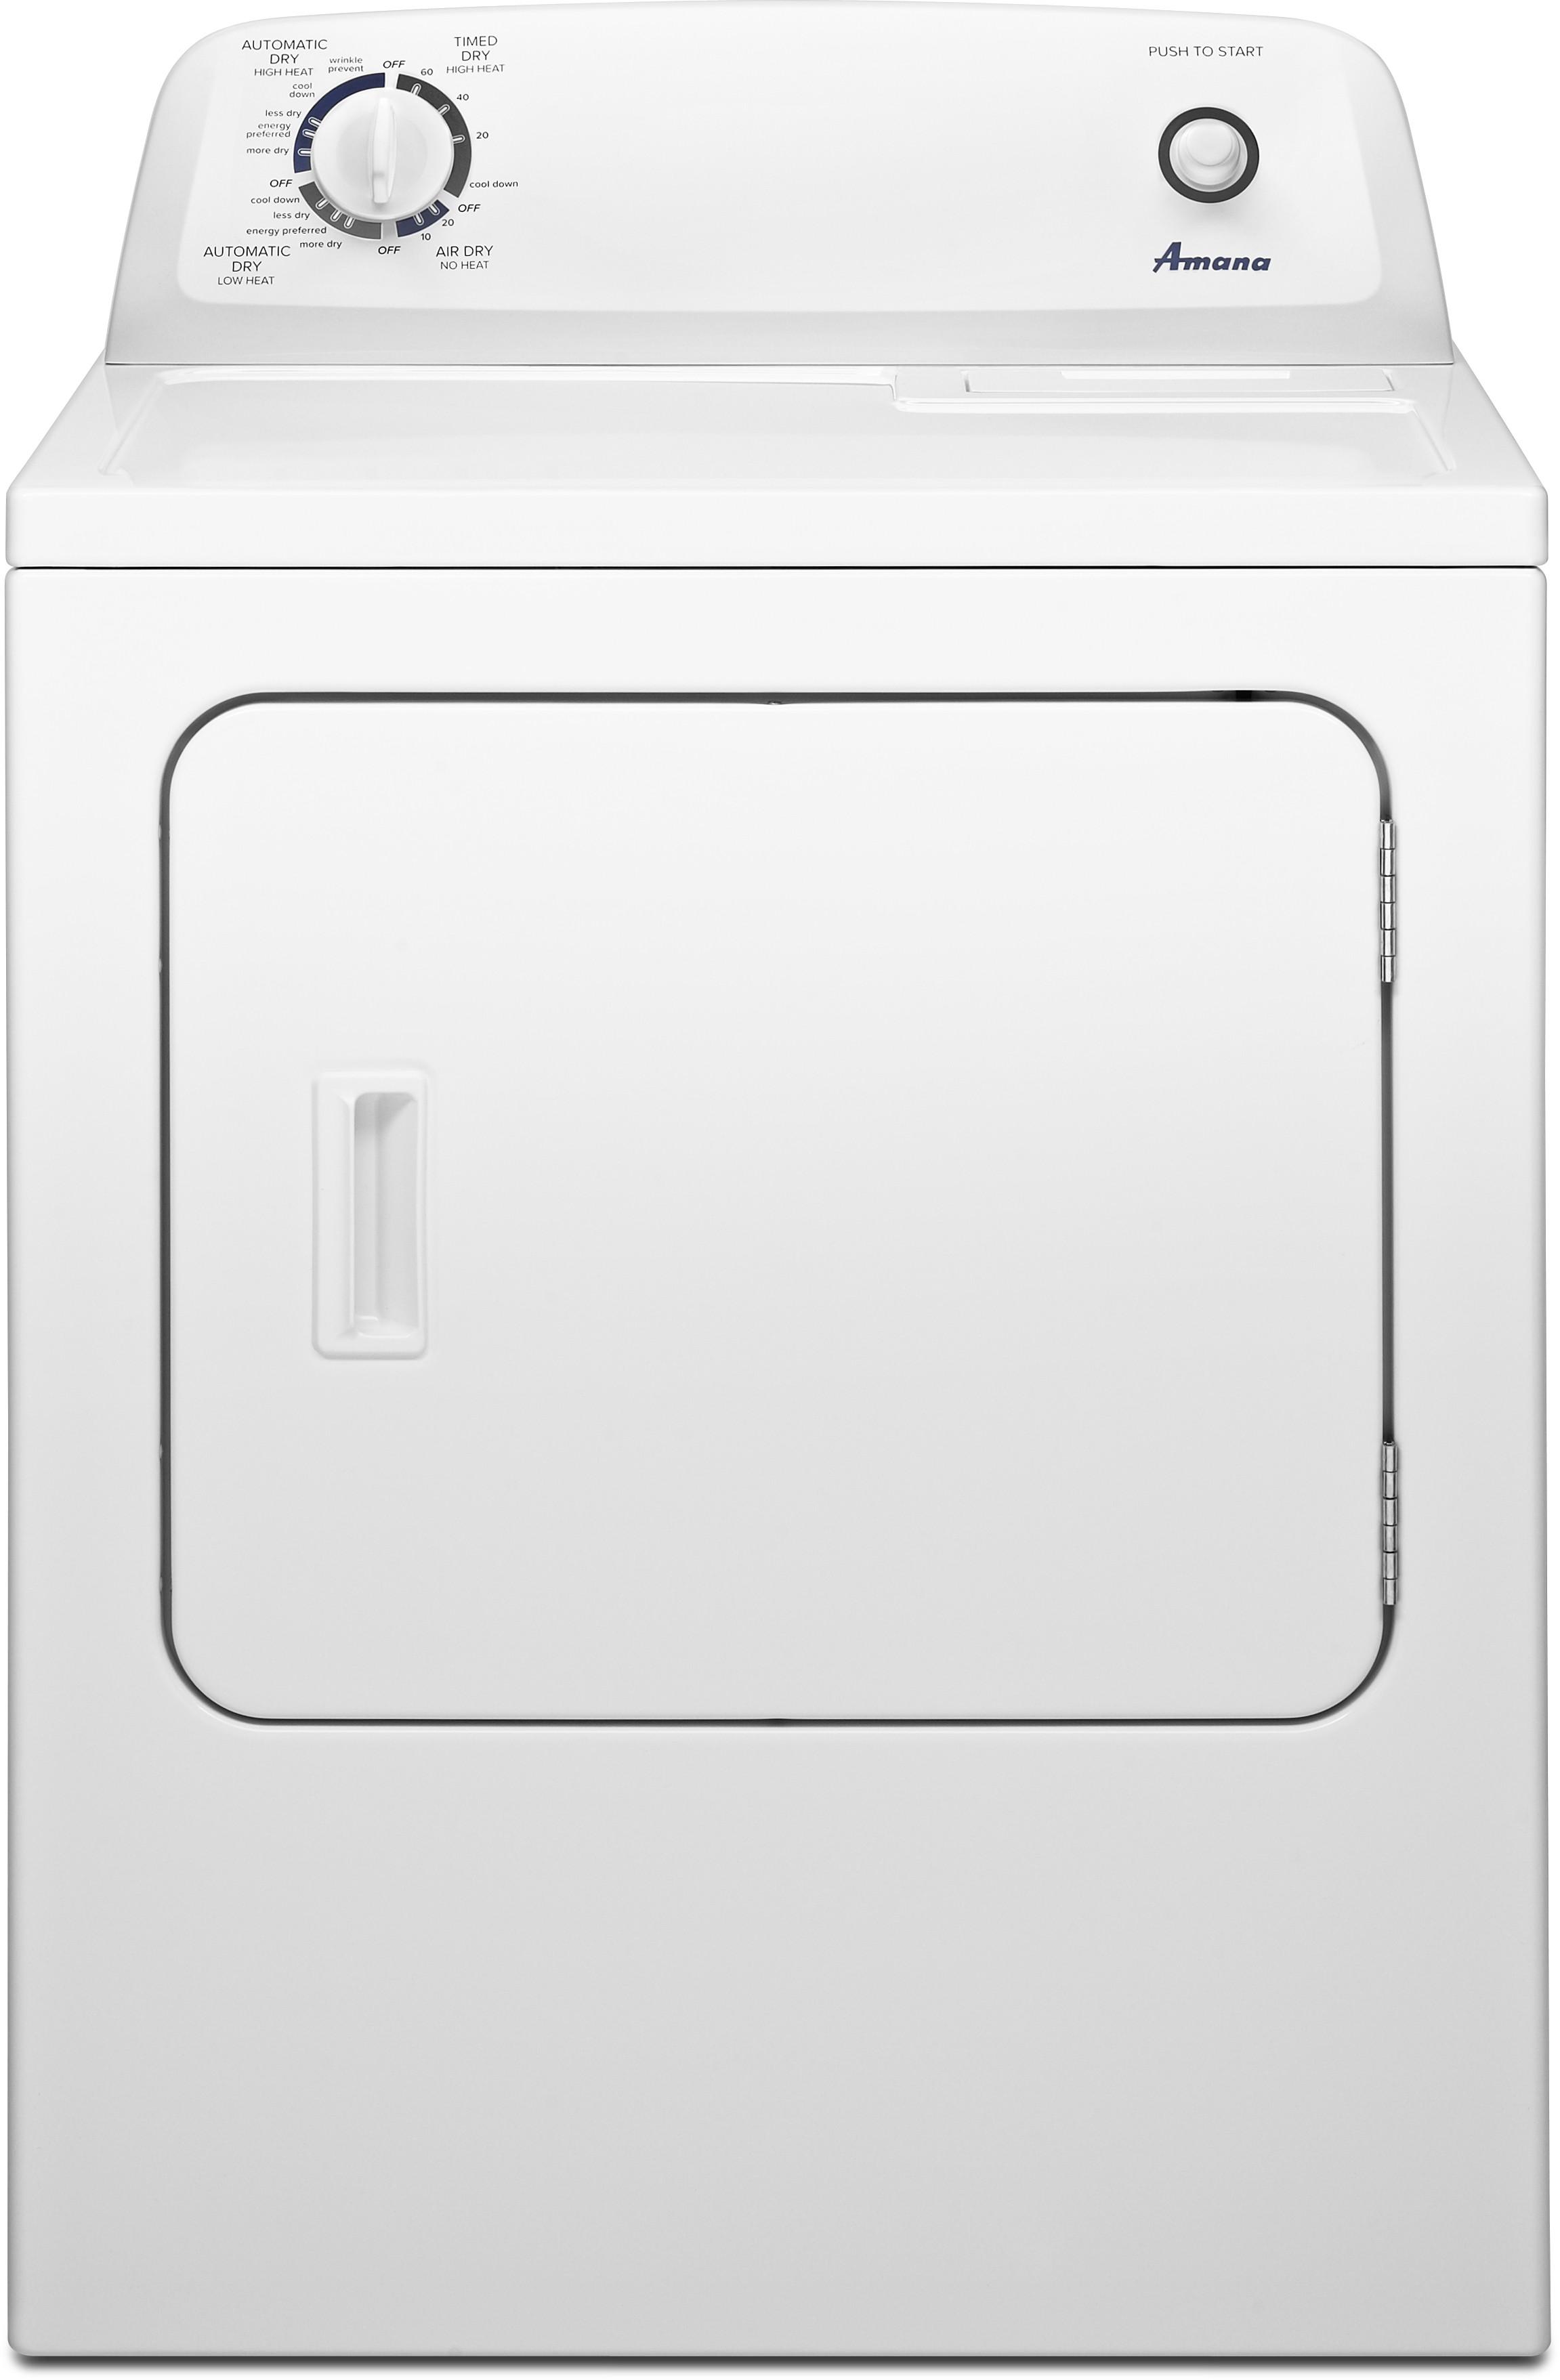 amana gas dryer wiring diagram  | 218 x 285